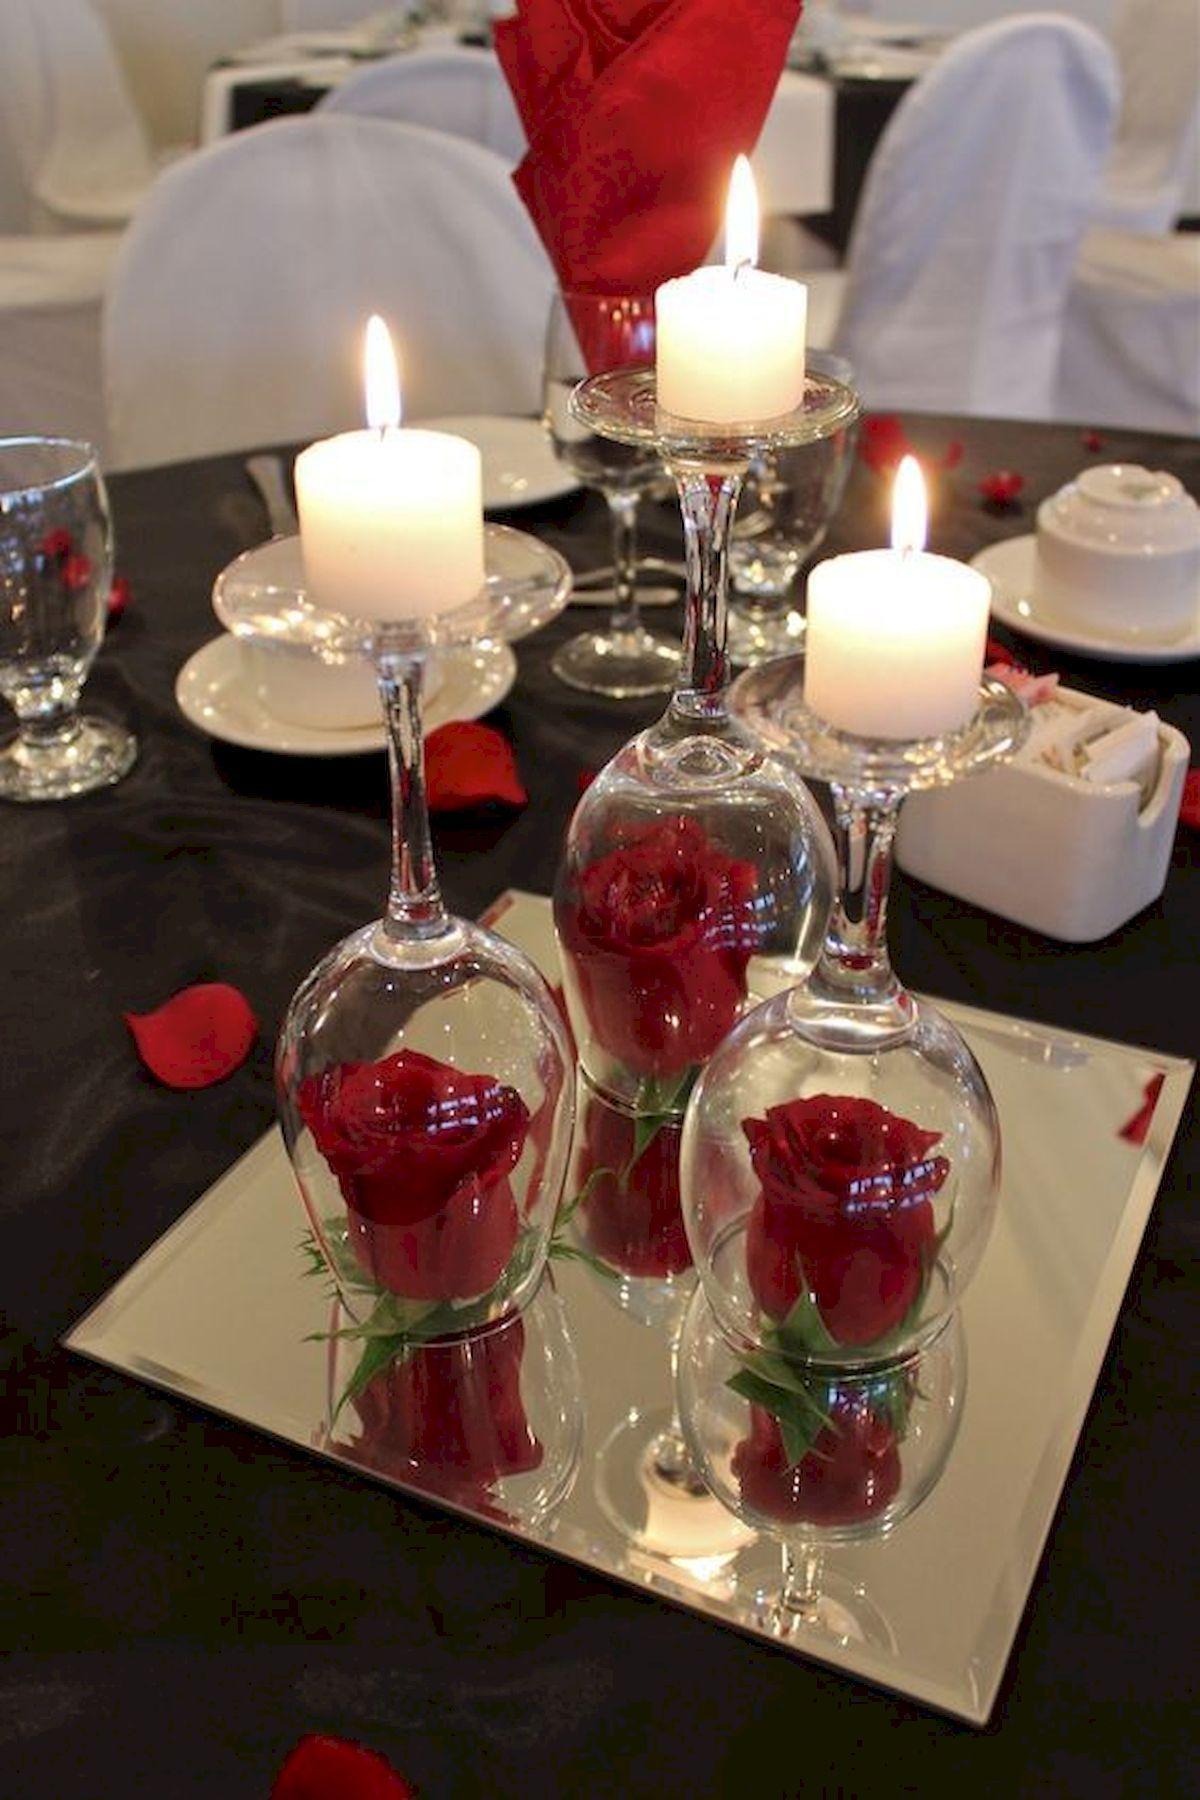 Romantic Dinner Ideas Https Hajarfresh Com Romantic Dinner Ideas Decora Wedding Table Centerpieces Diy Table Centerpieces Diy Christmas Table Centerpieces